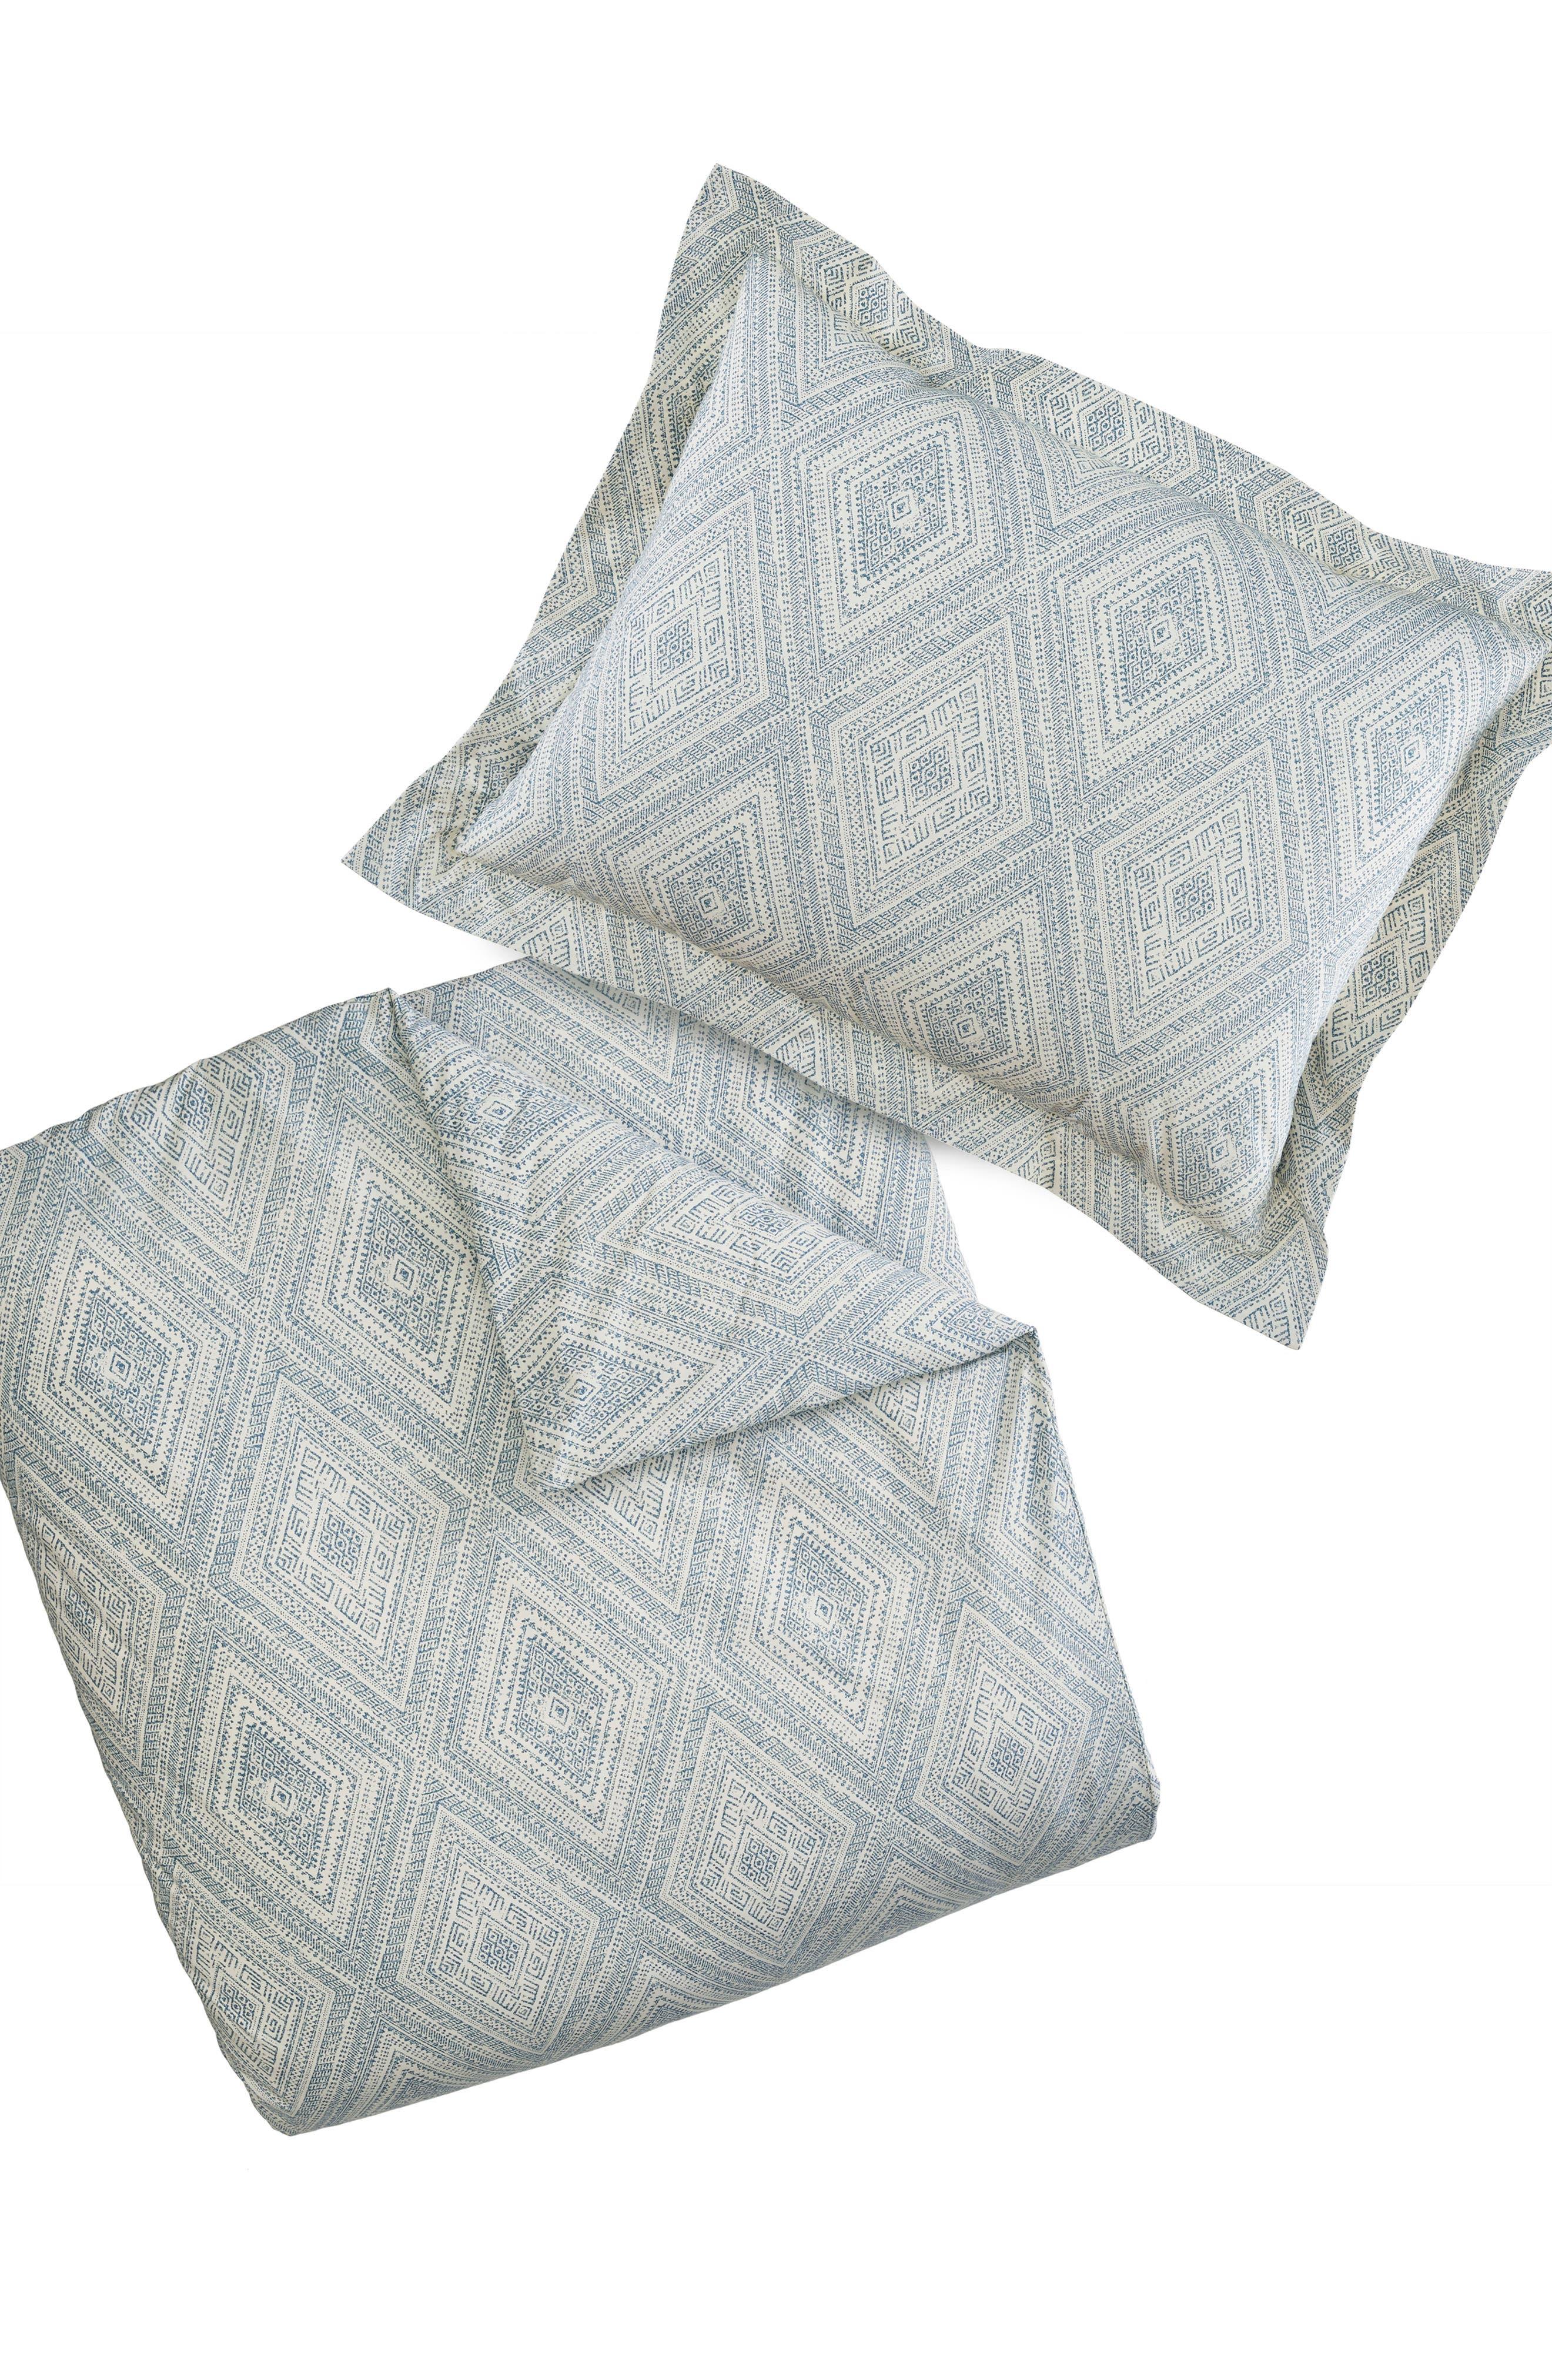 Caspiane 200 Thread Count Pair of Pillow Shams,                             Alternate thumbnail 3, color,                             Turquoise/ Aqua